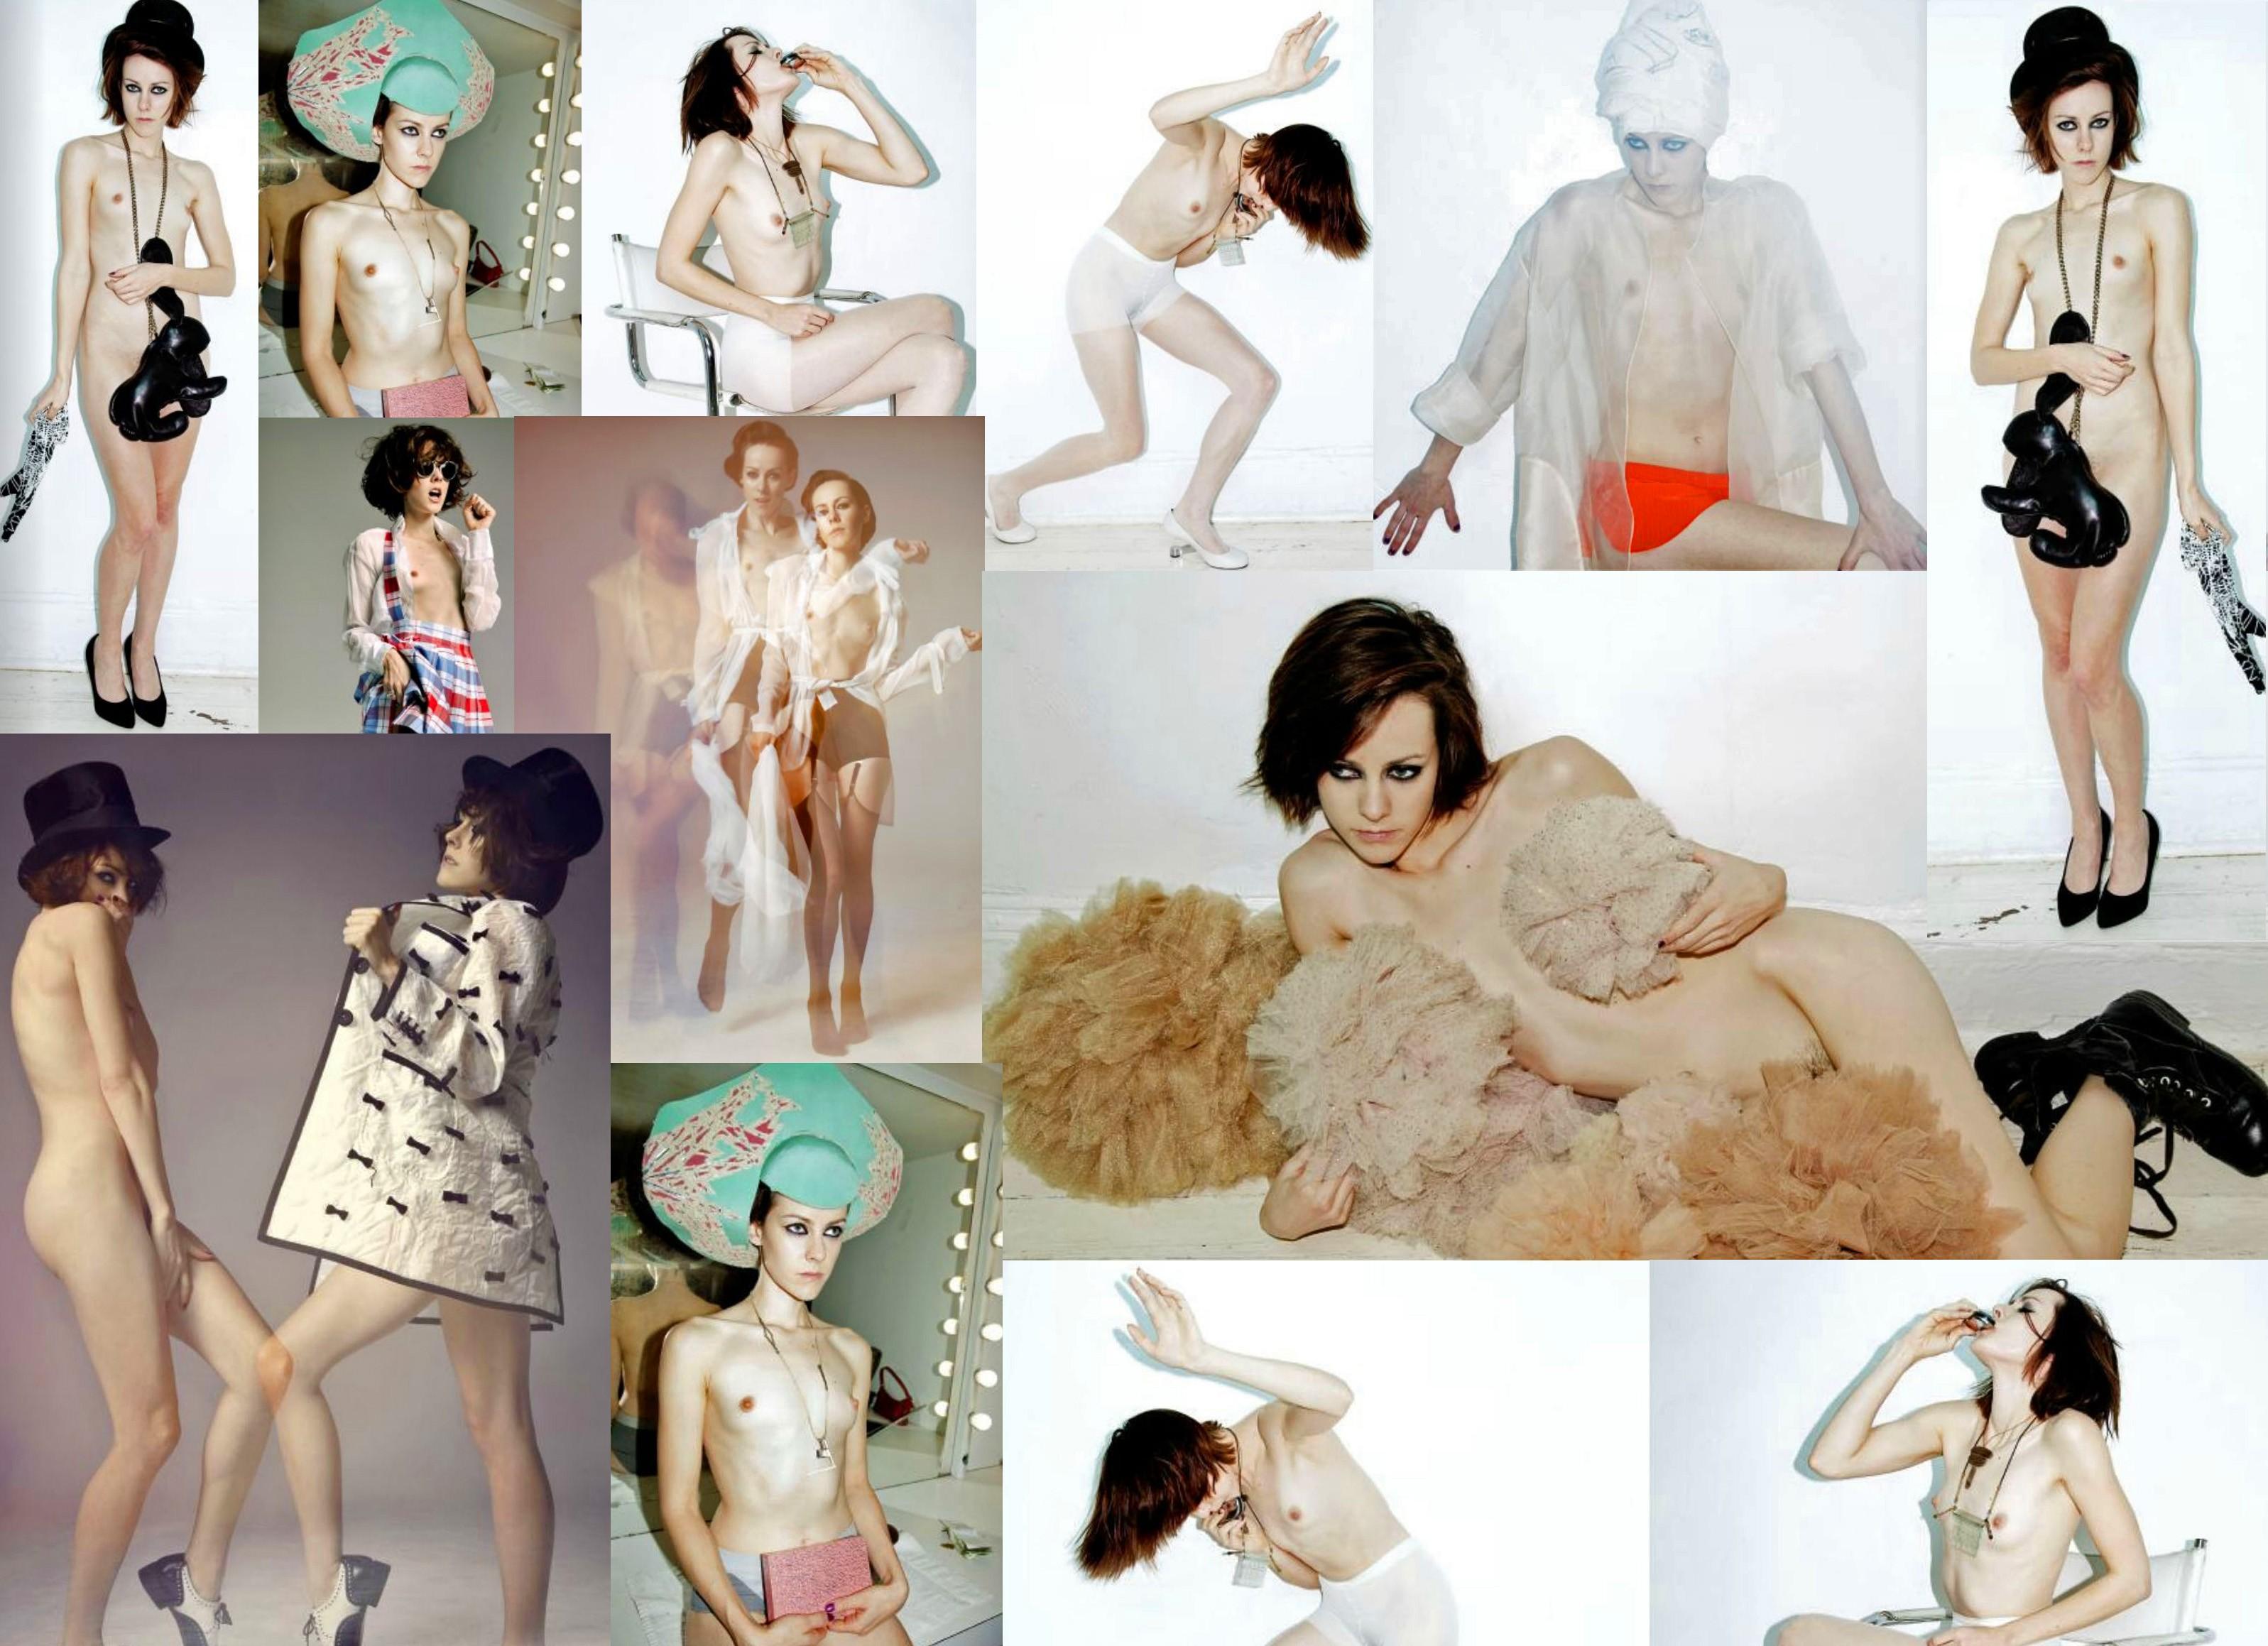 Jena Malone fotos filtradas desnuda